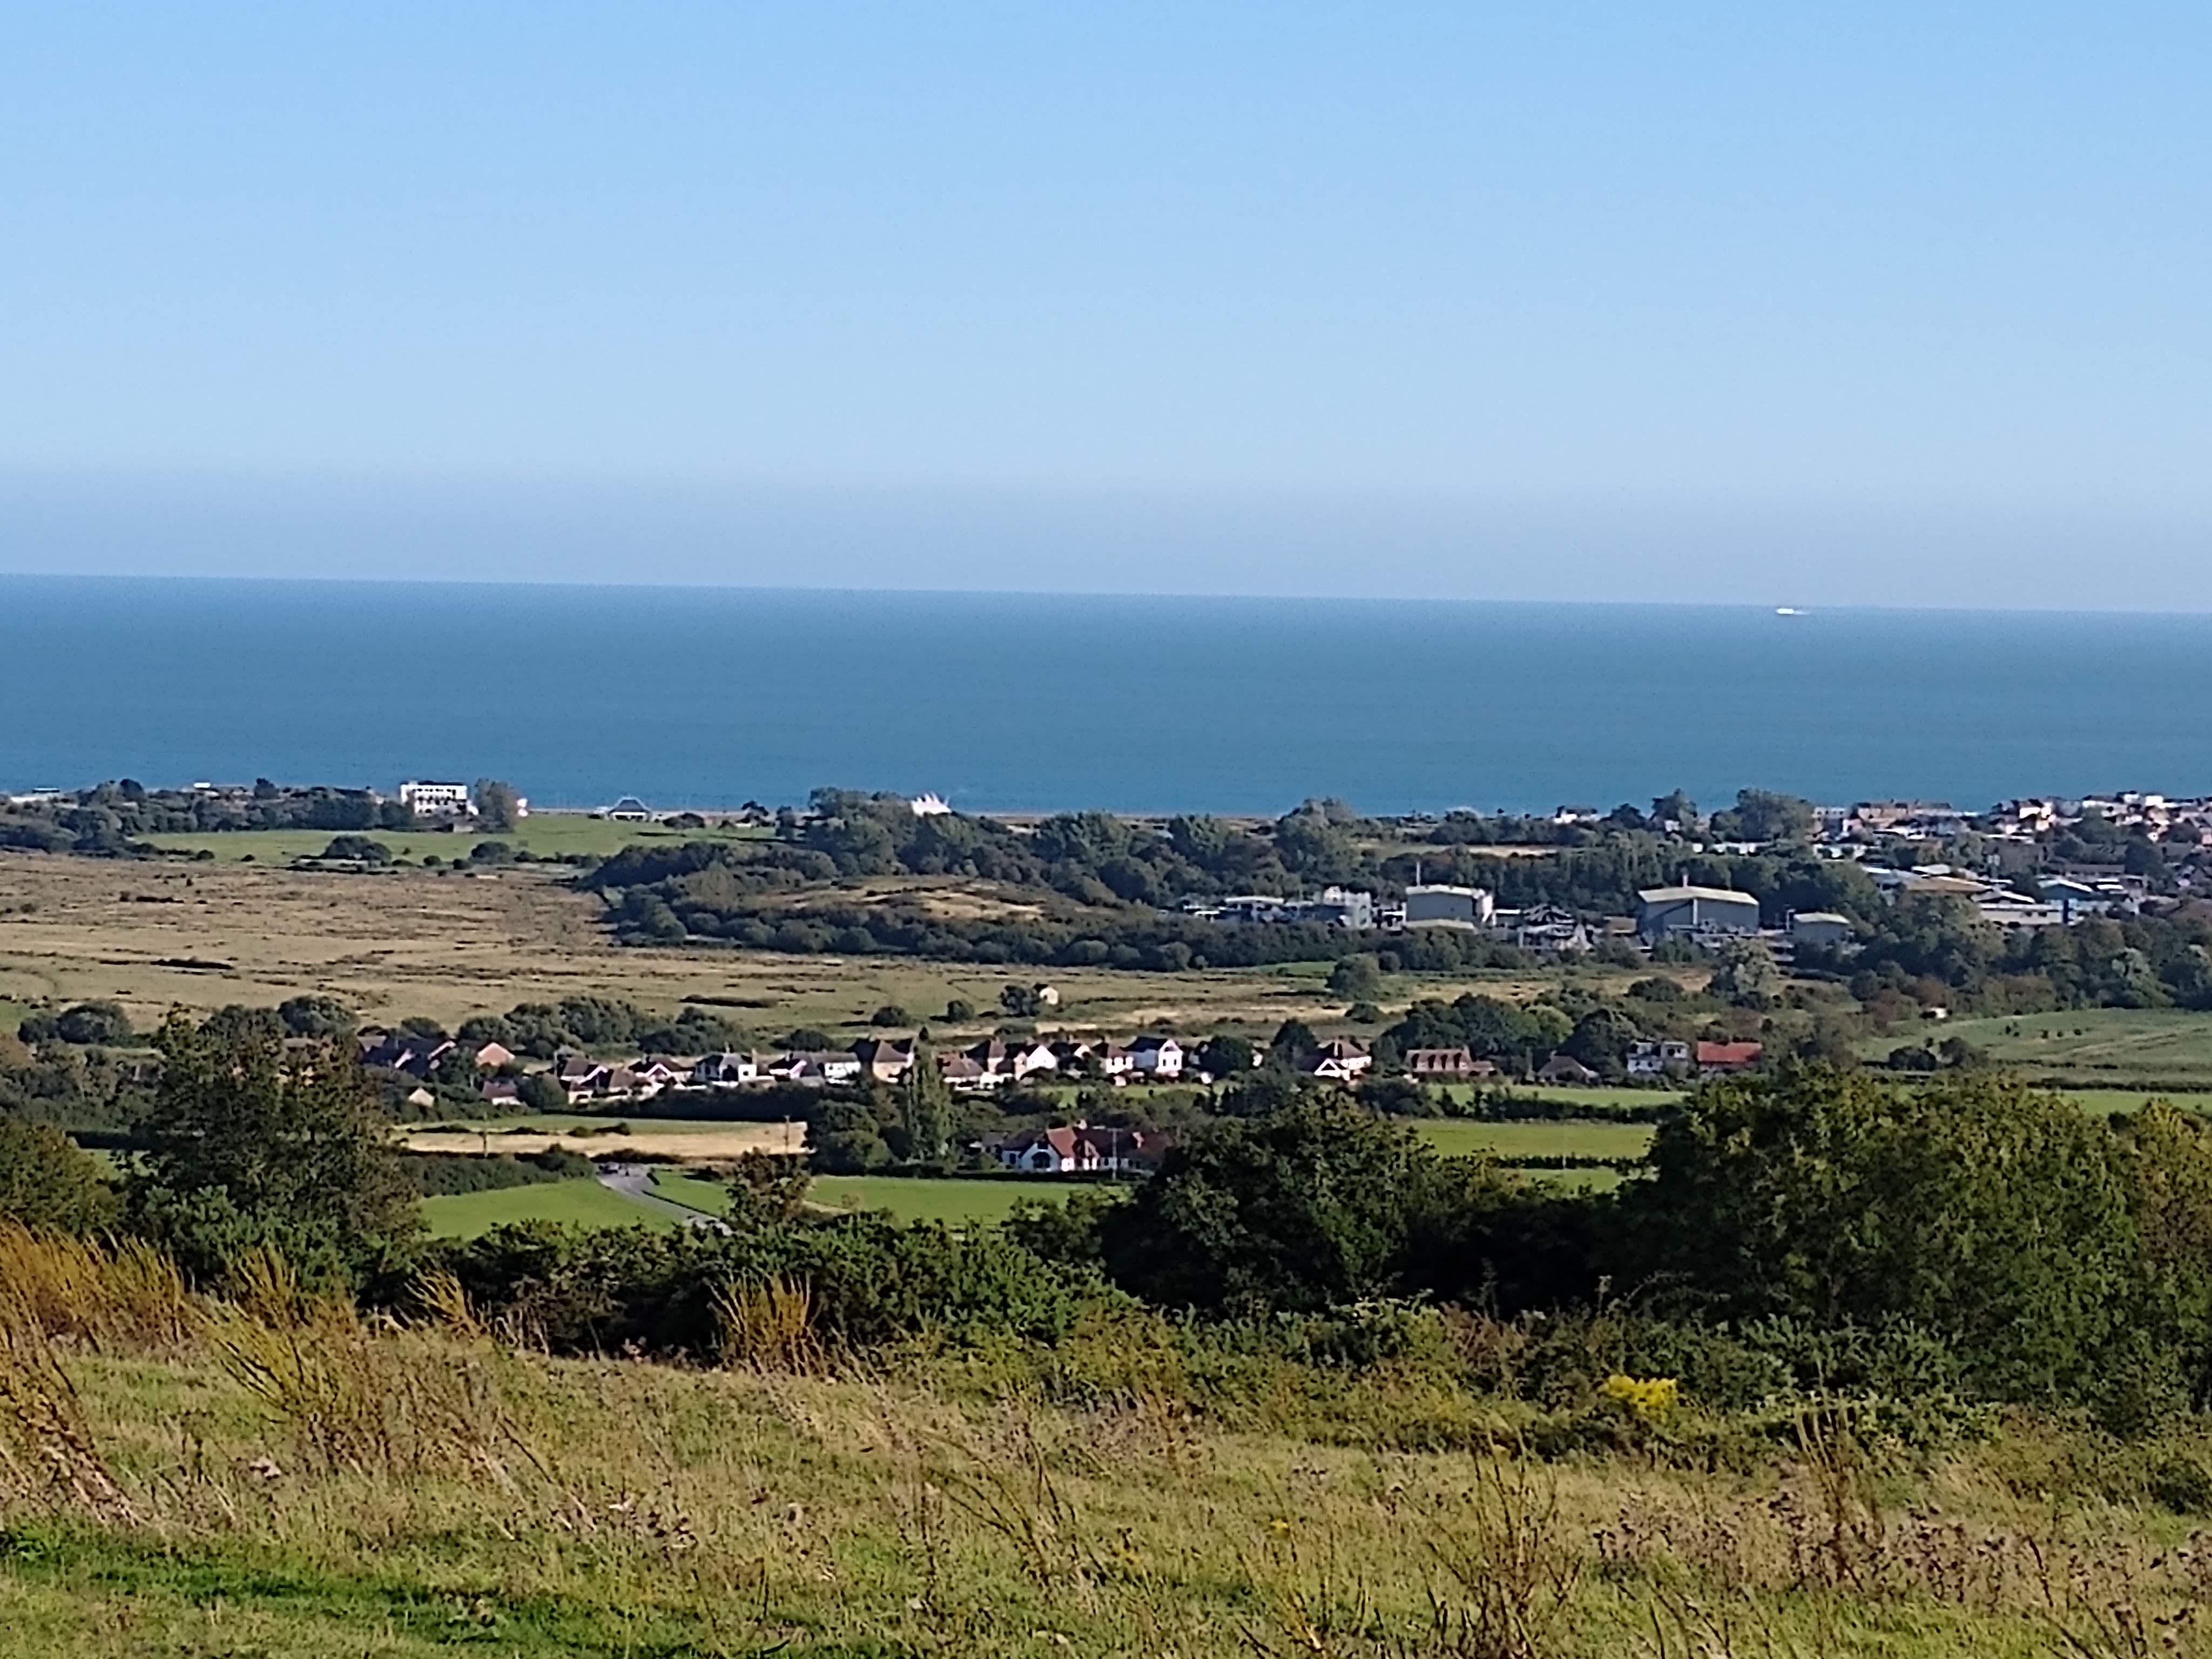 Views across the downs towards Bembridge